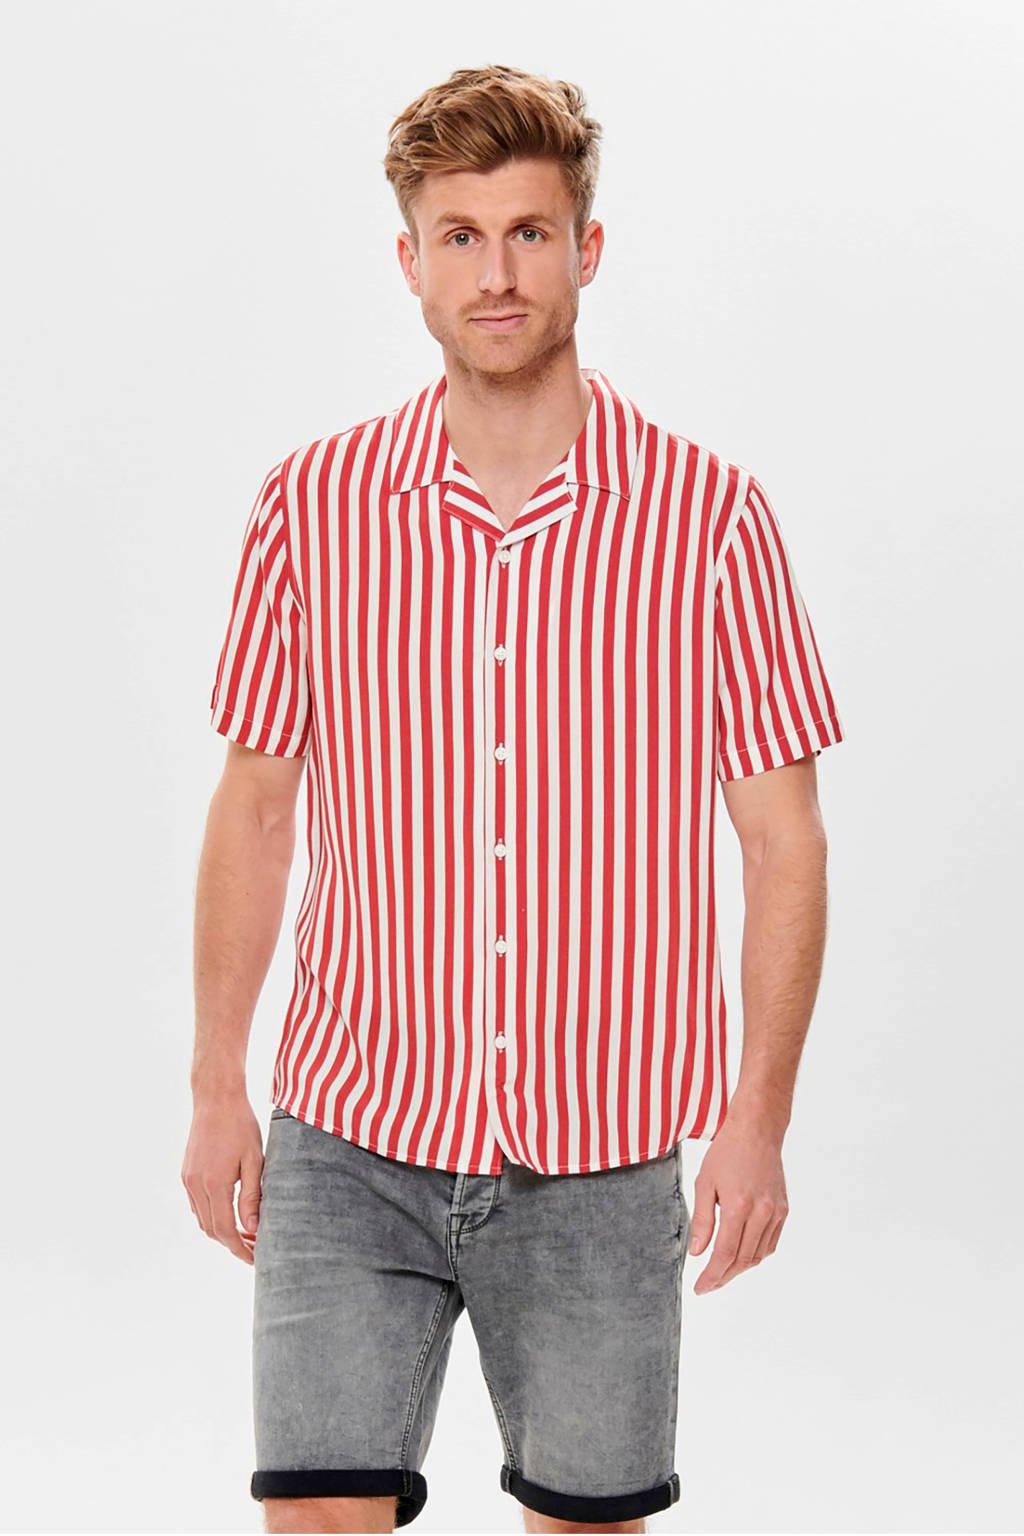 ONLY & SONS gestreept regular fit overhemd rood, Rood/wit